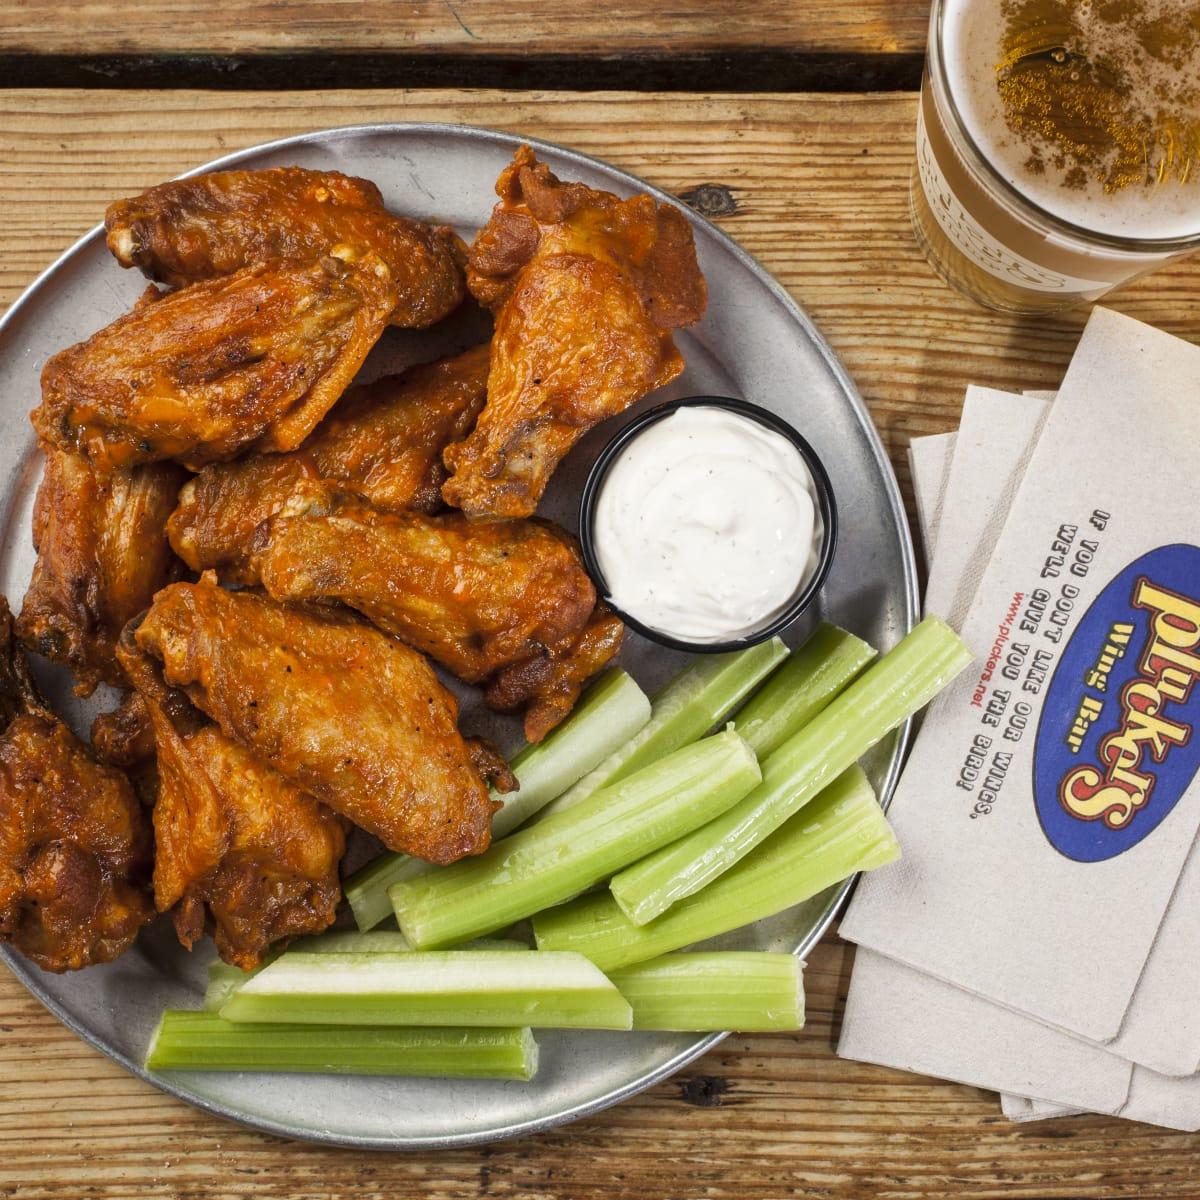 Pluckers 10 piece wings